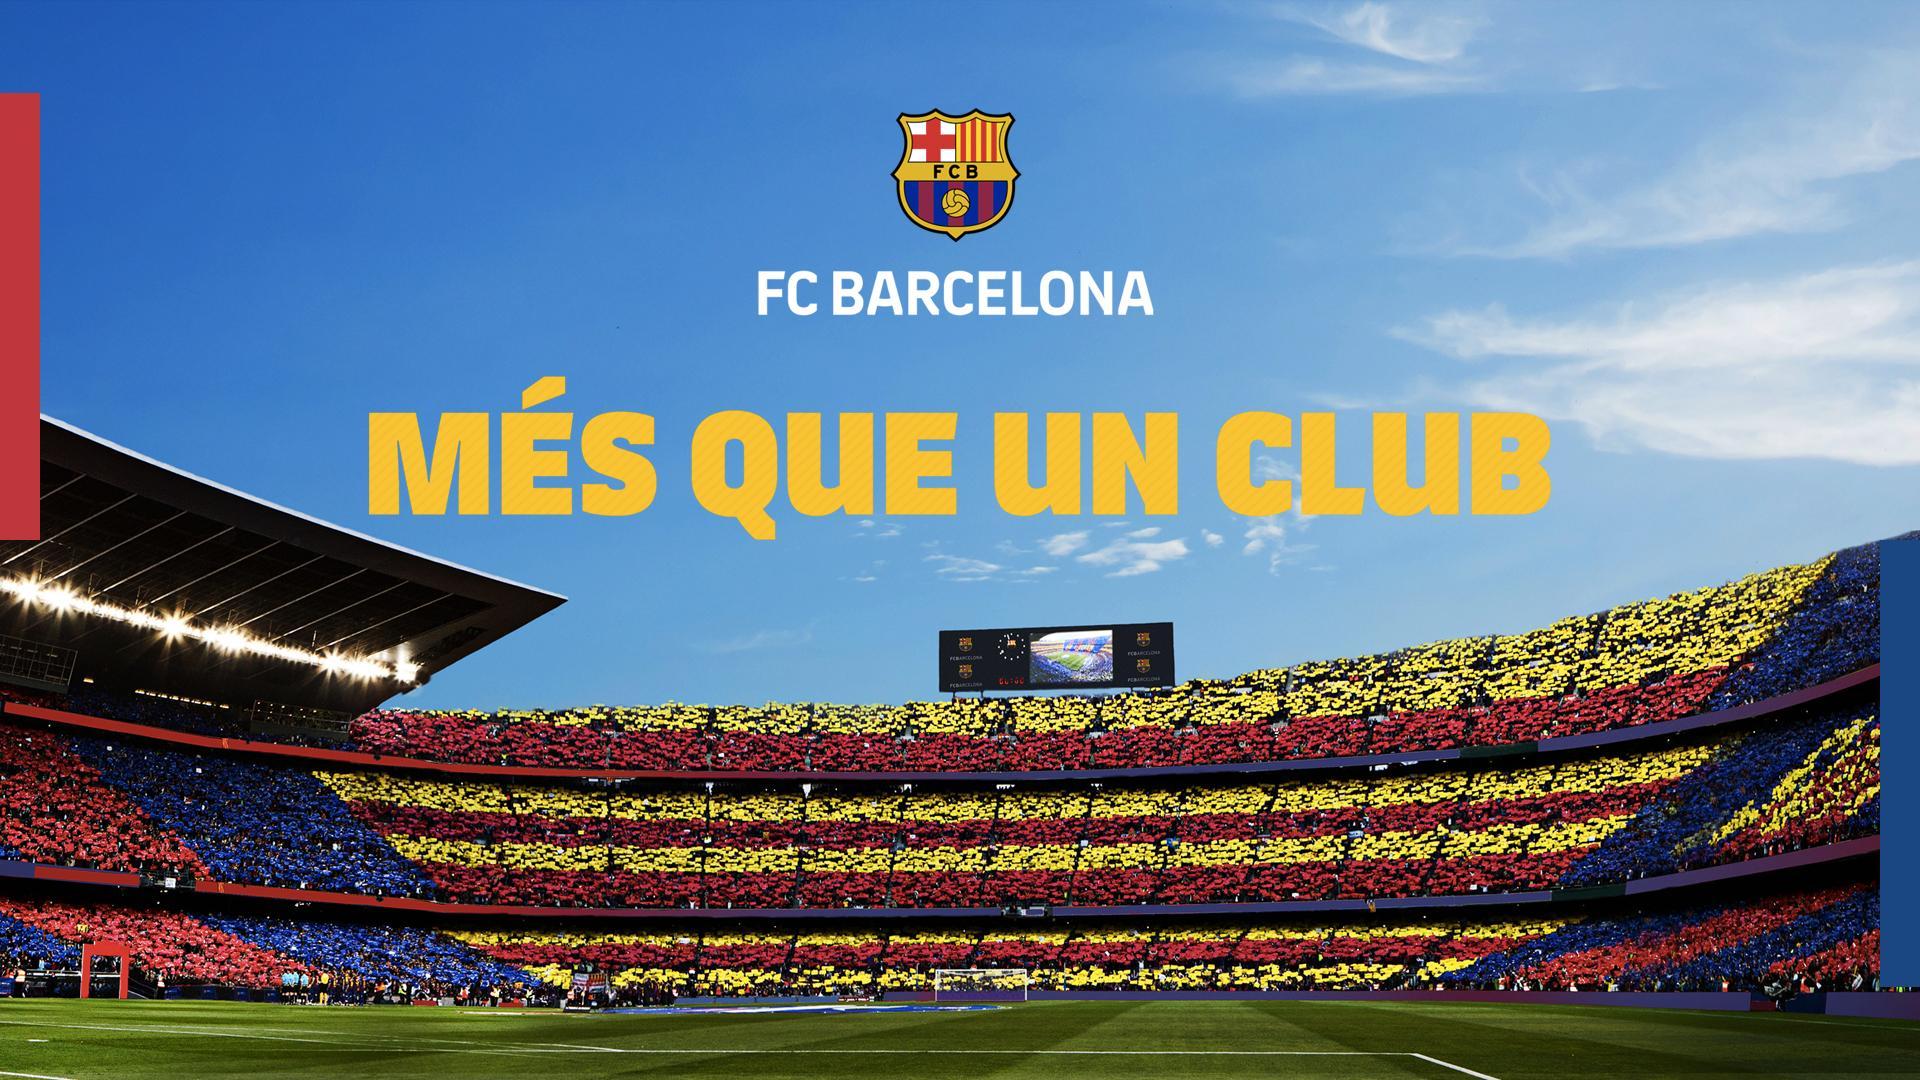 barça fans wallpapers official